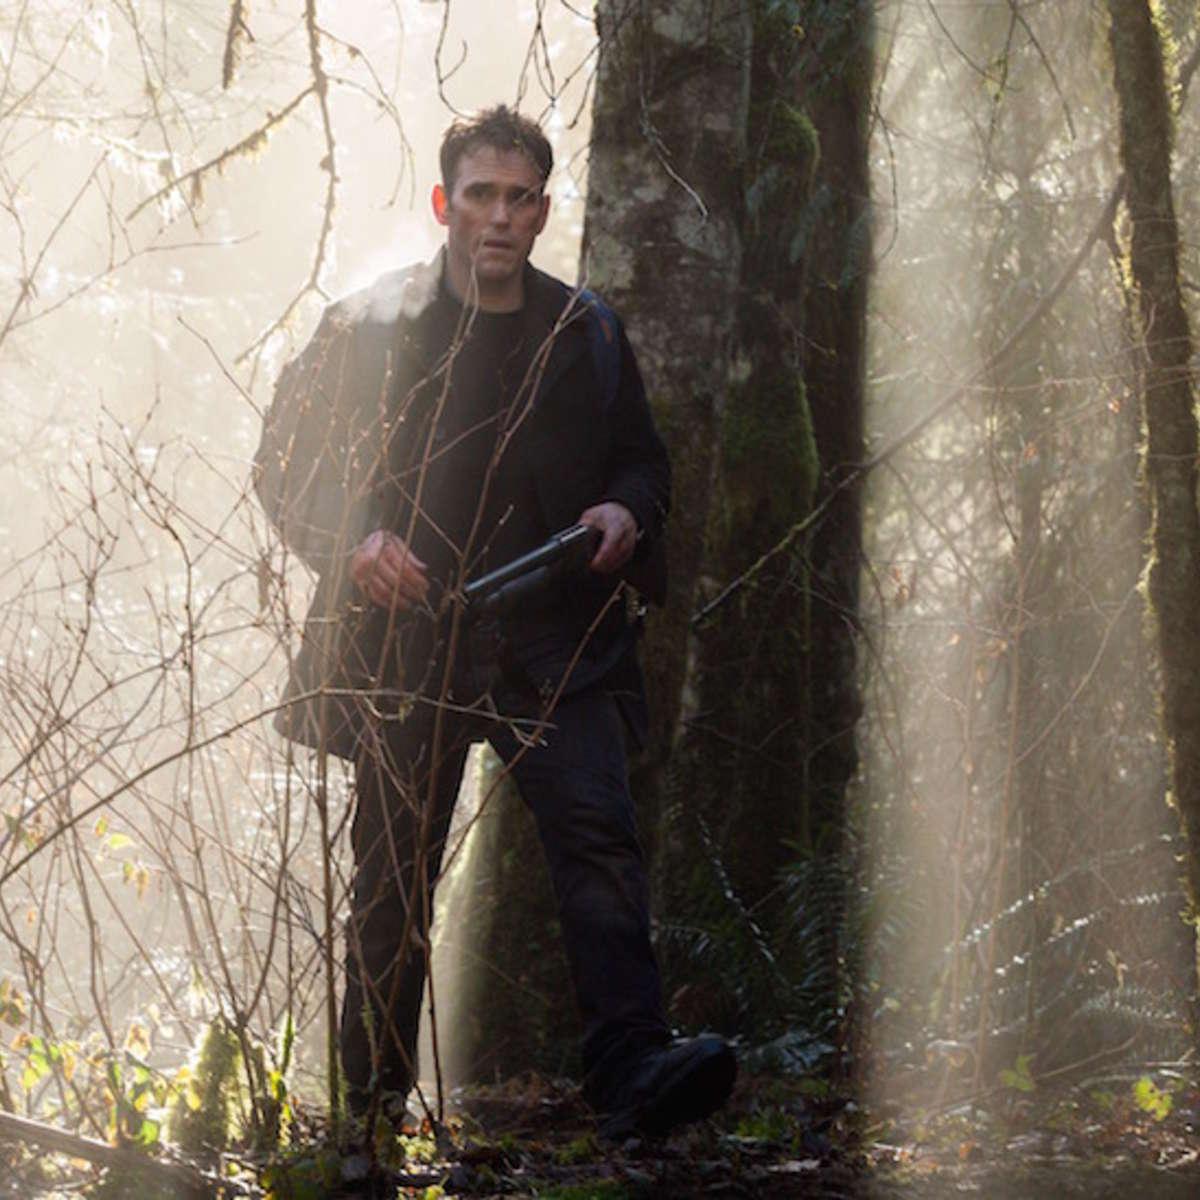 Wayward-Pines-1x05-8.jpg